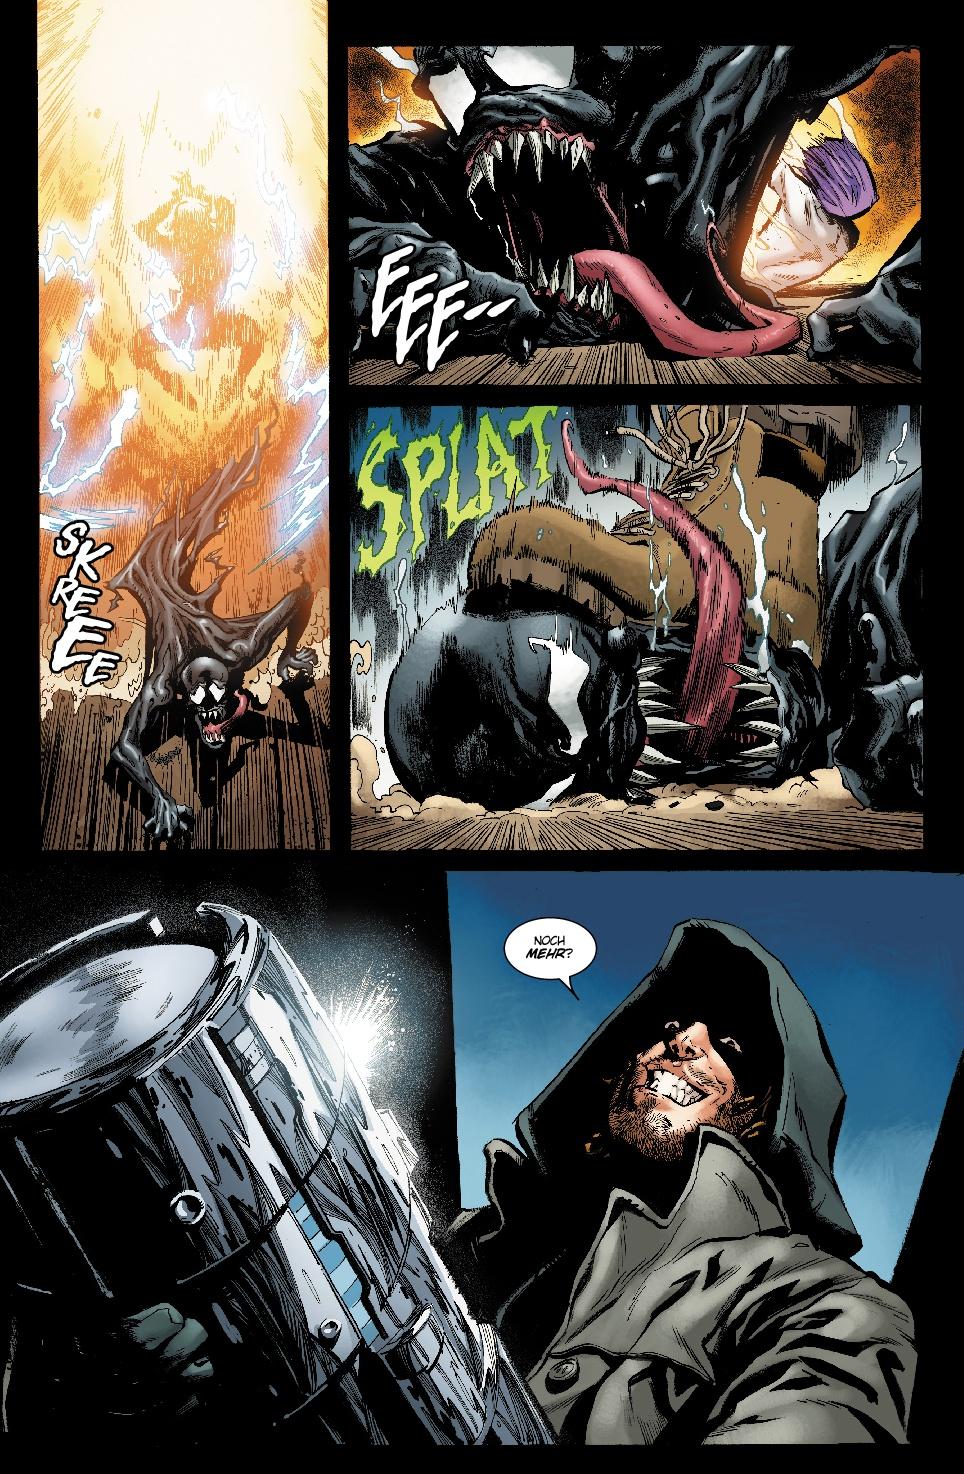 MARVEL: SPIDER-MAN & VENOM: VENOM INC. | PANINI VERLAG (aus dem Inhalt)